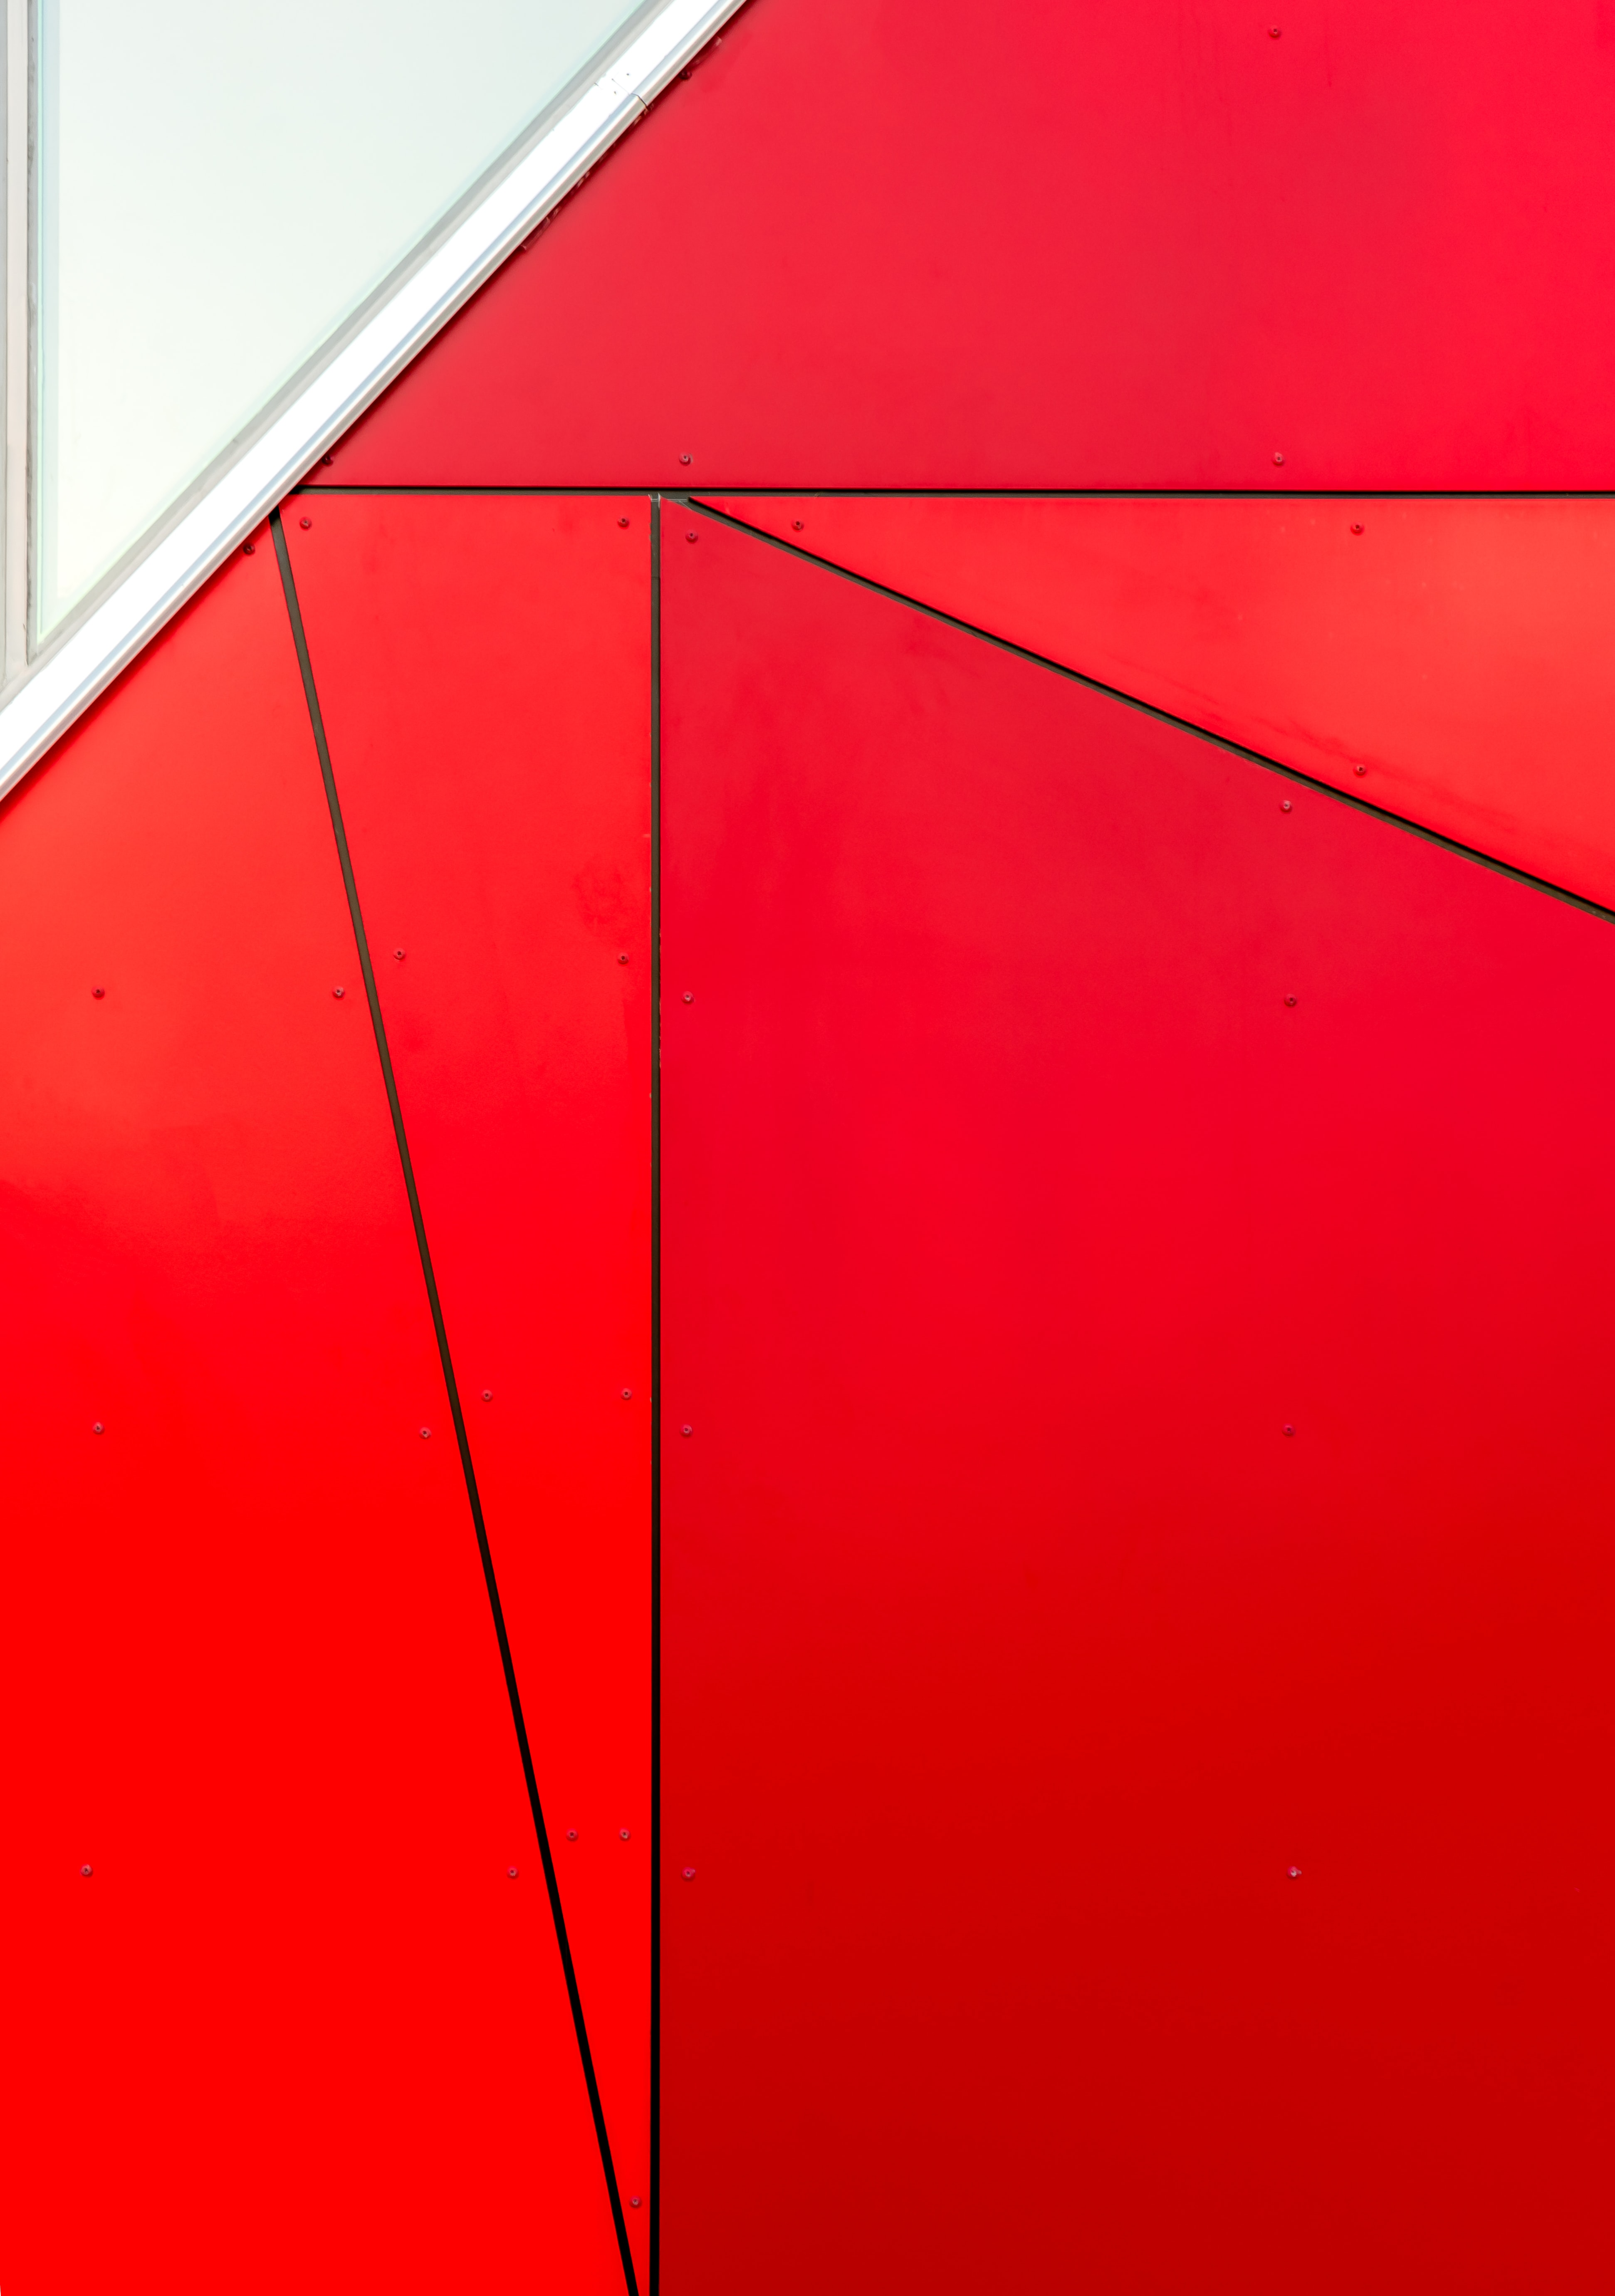 closeup photo of red board